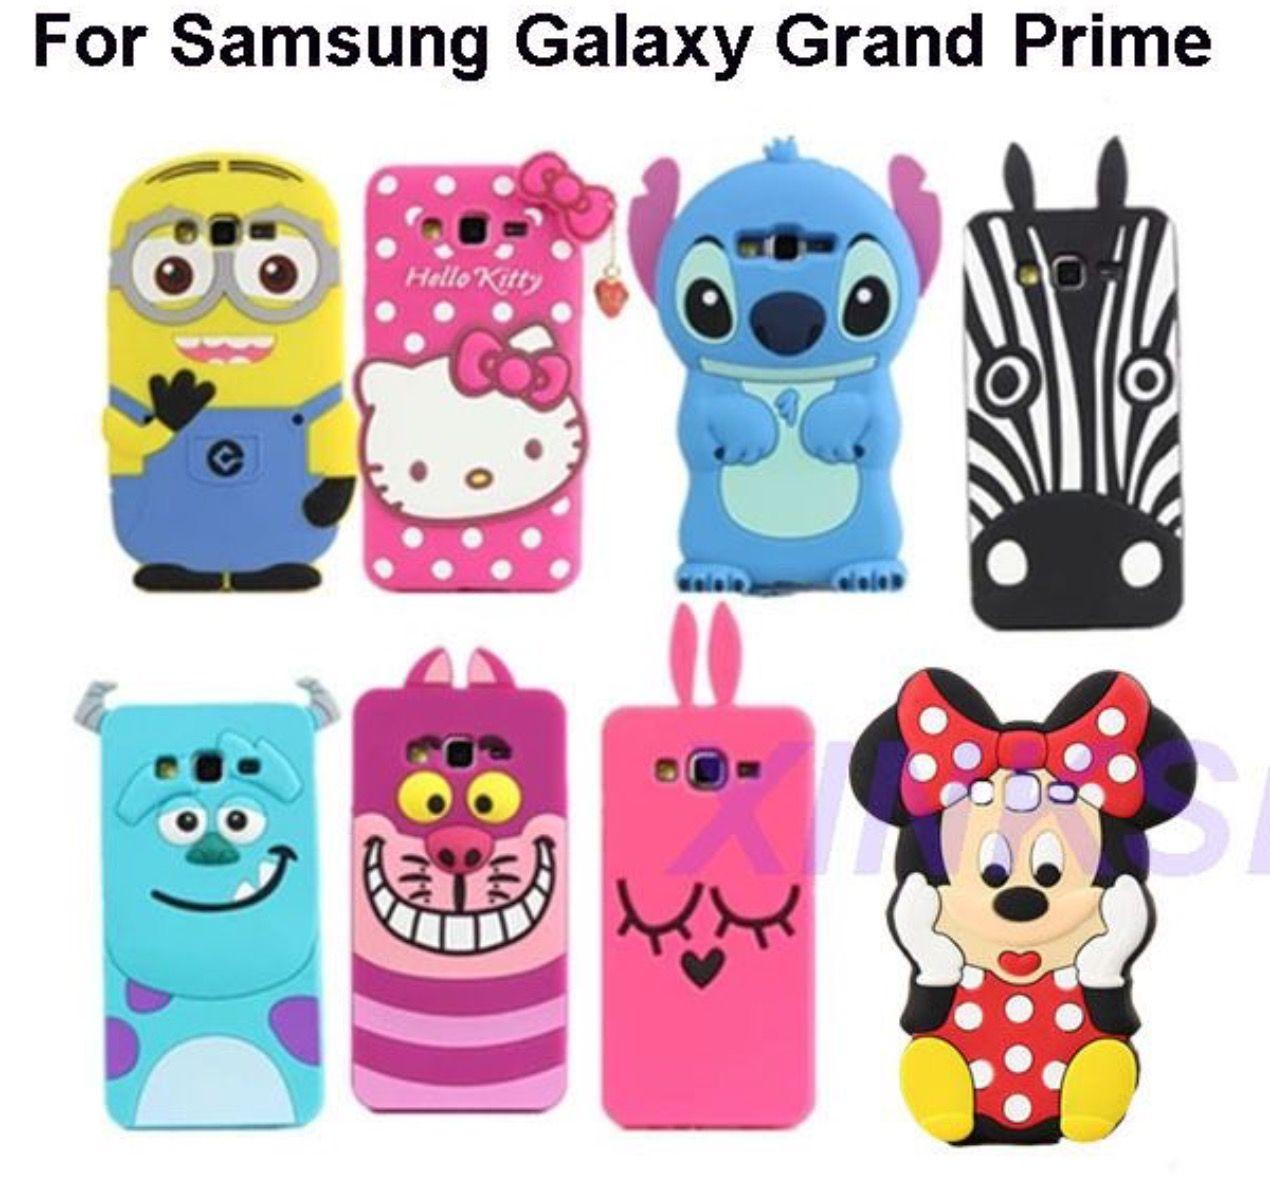 carcasas para celular samsung galaxy grand prime